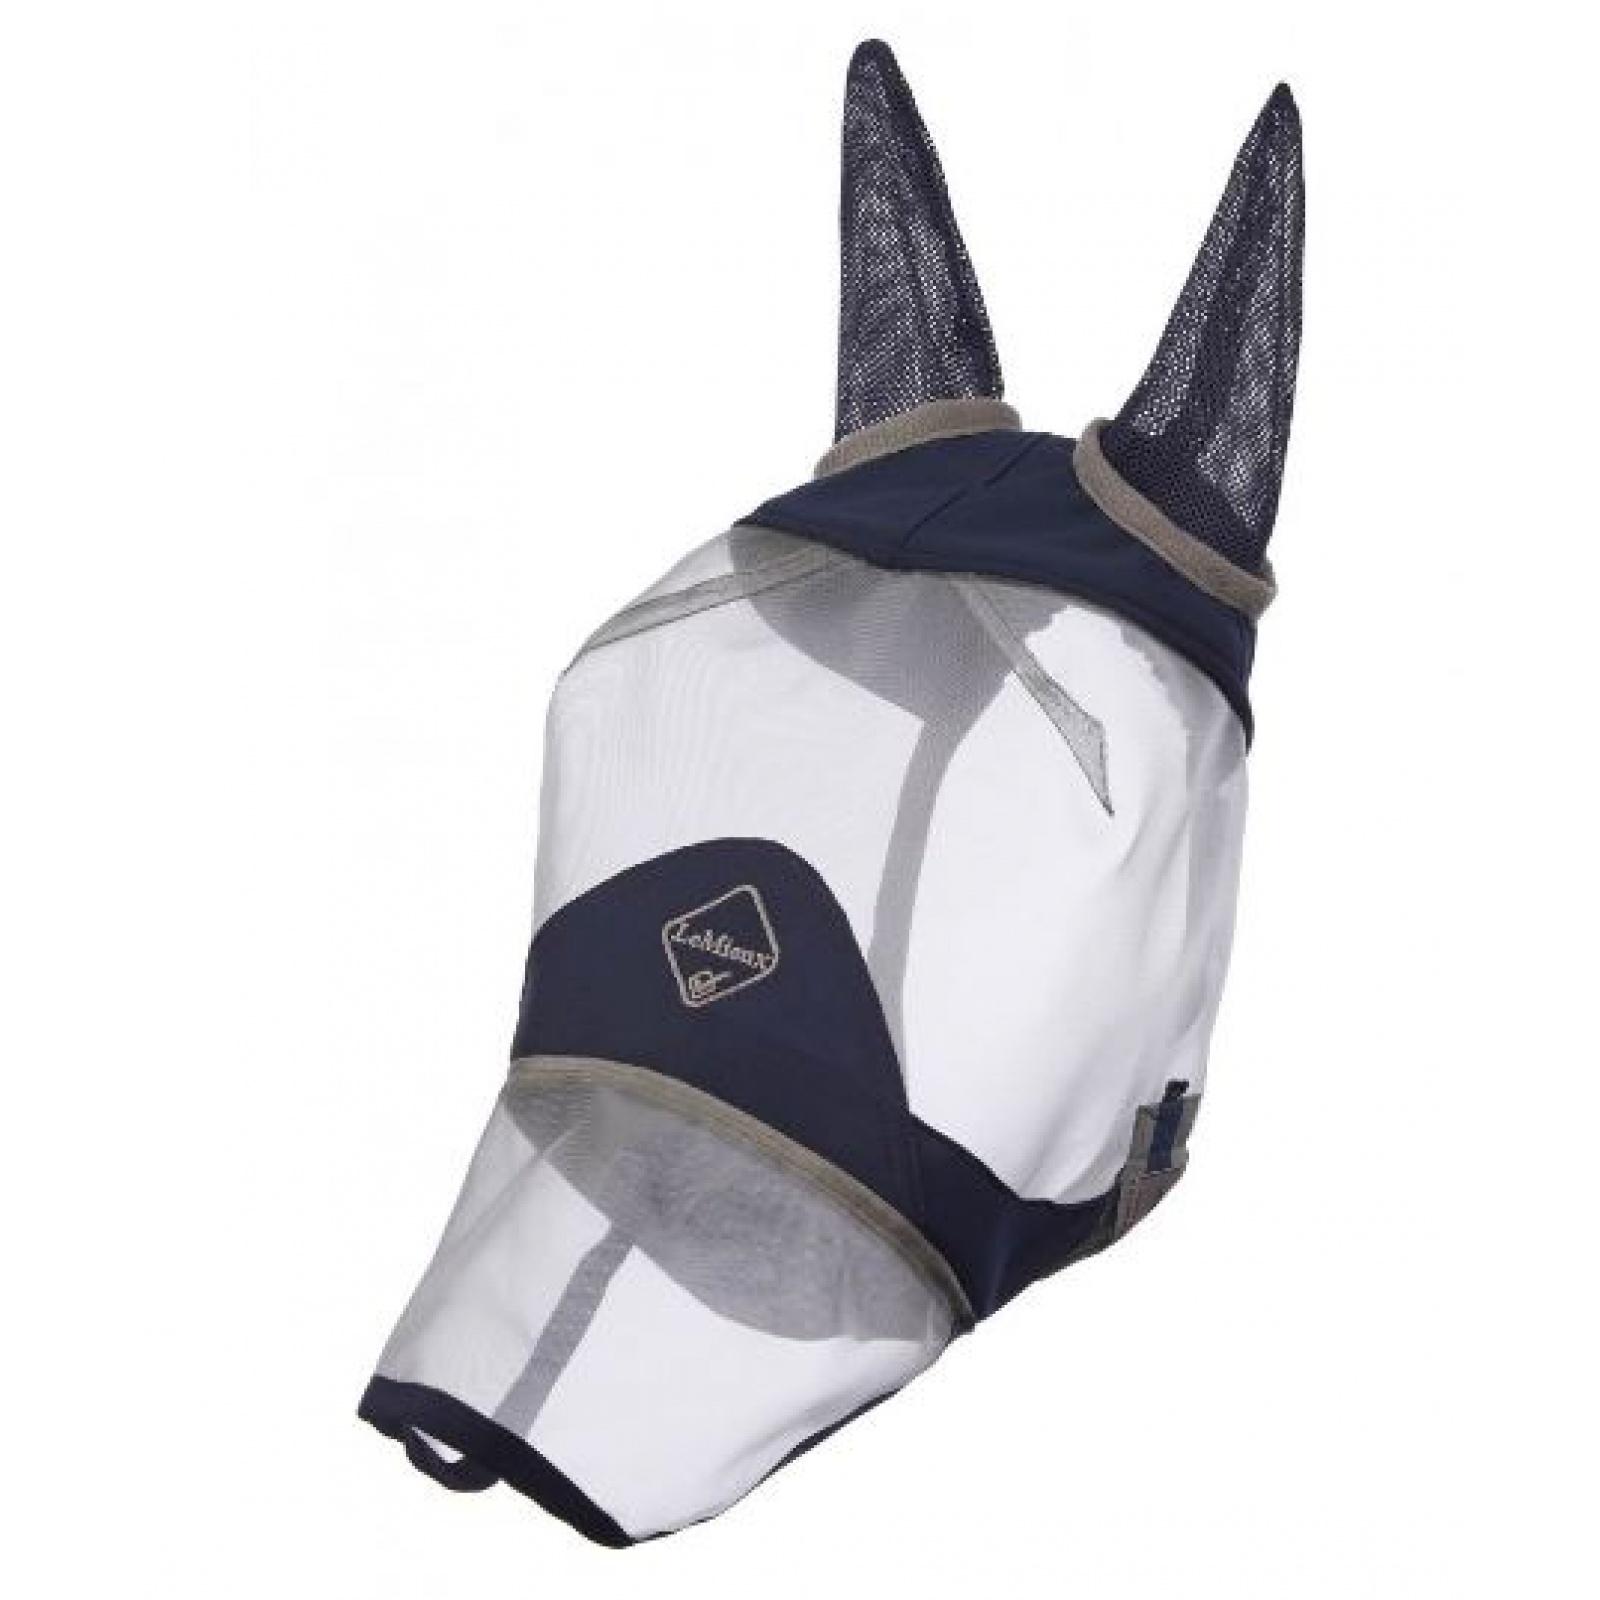 LeMieux-Armour-Shield-Fly-Protector-Mask thumbnail 7